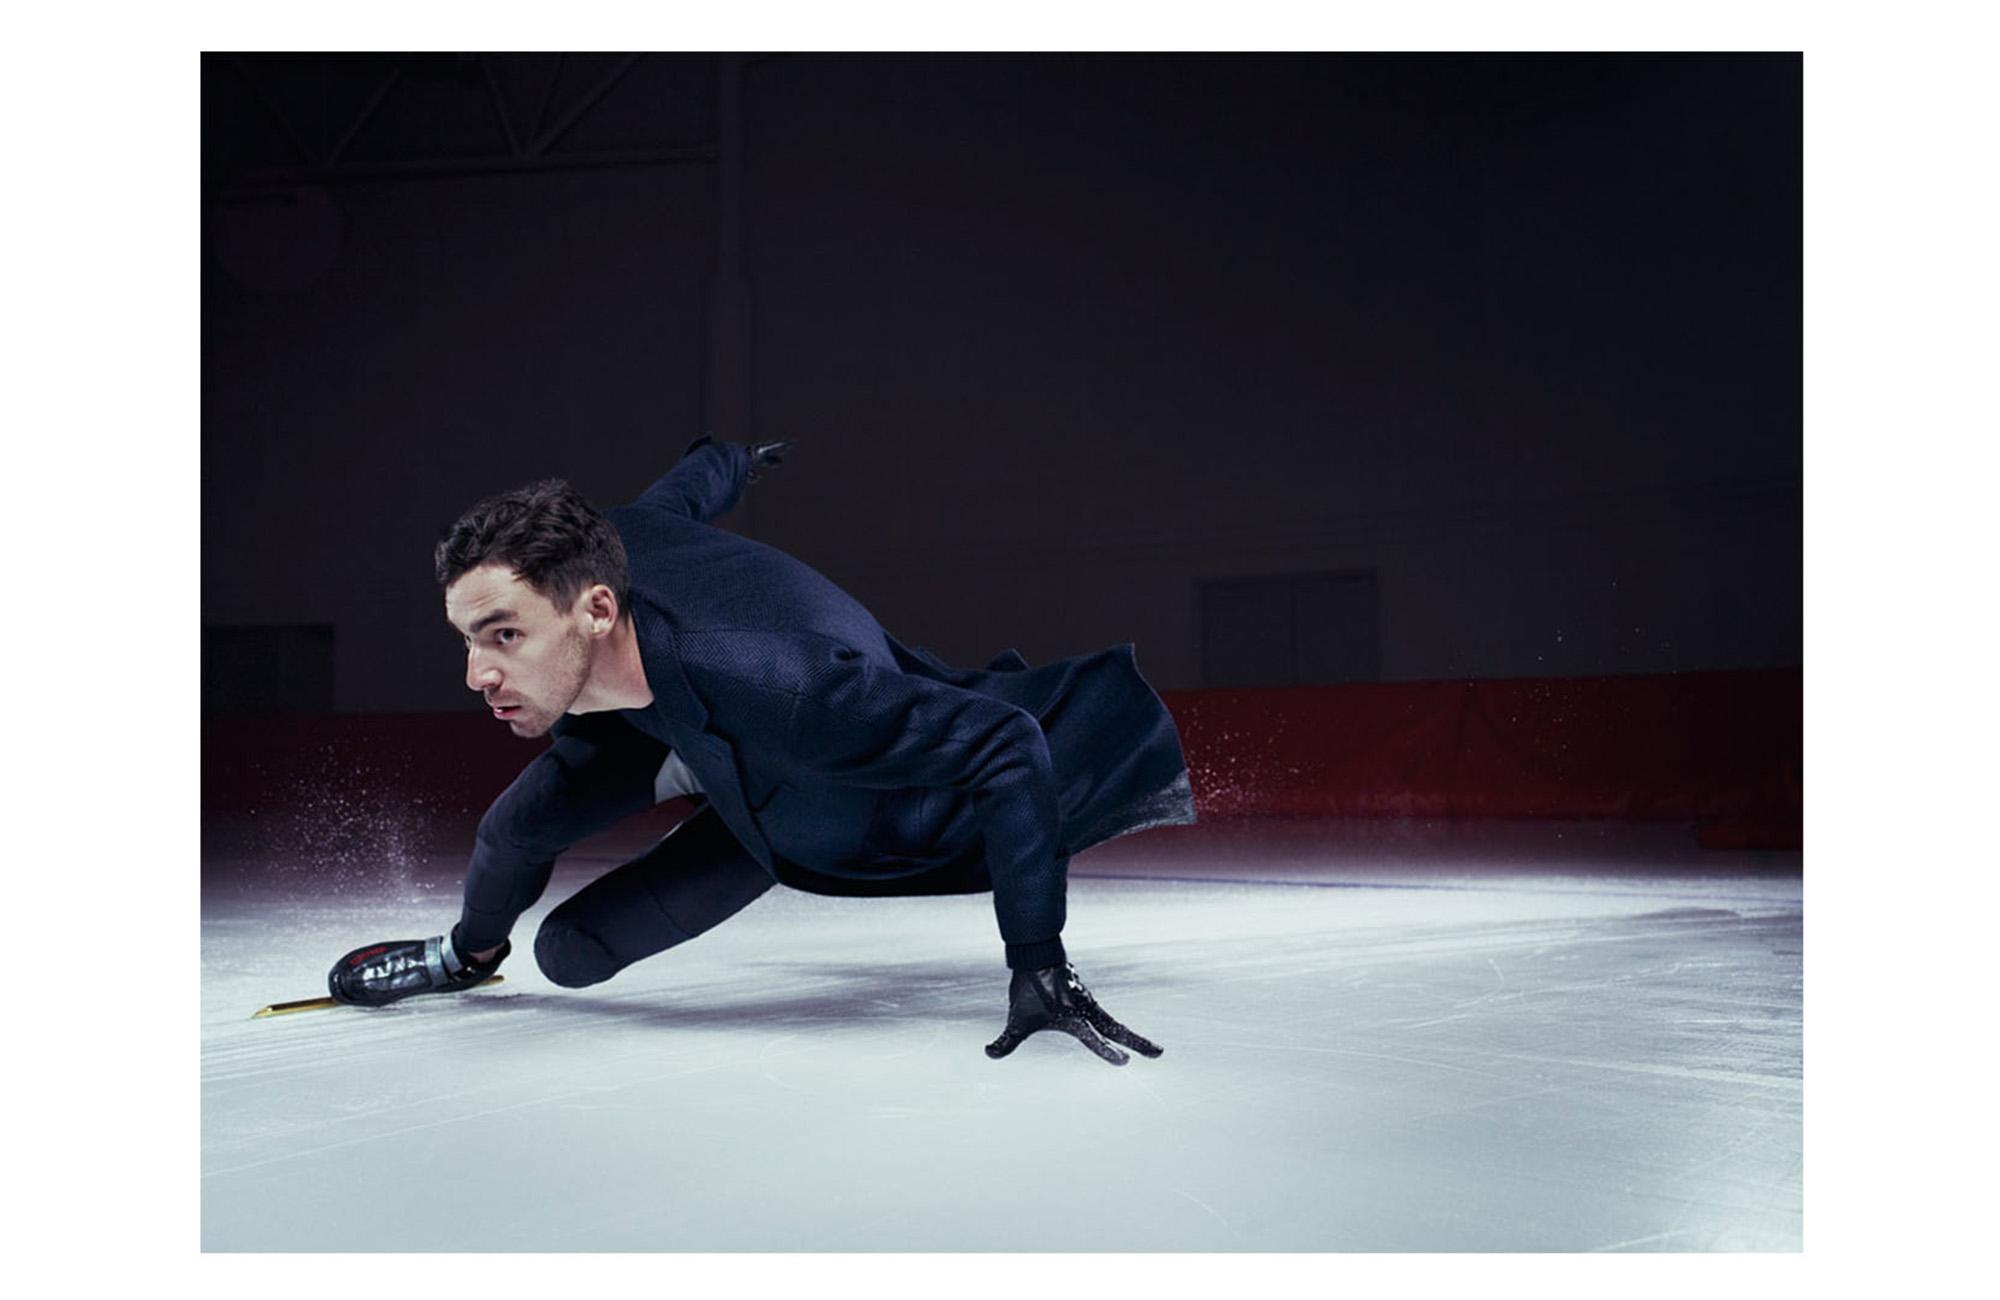 Mens Journal / US Speed Skaters - 2 of 3